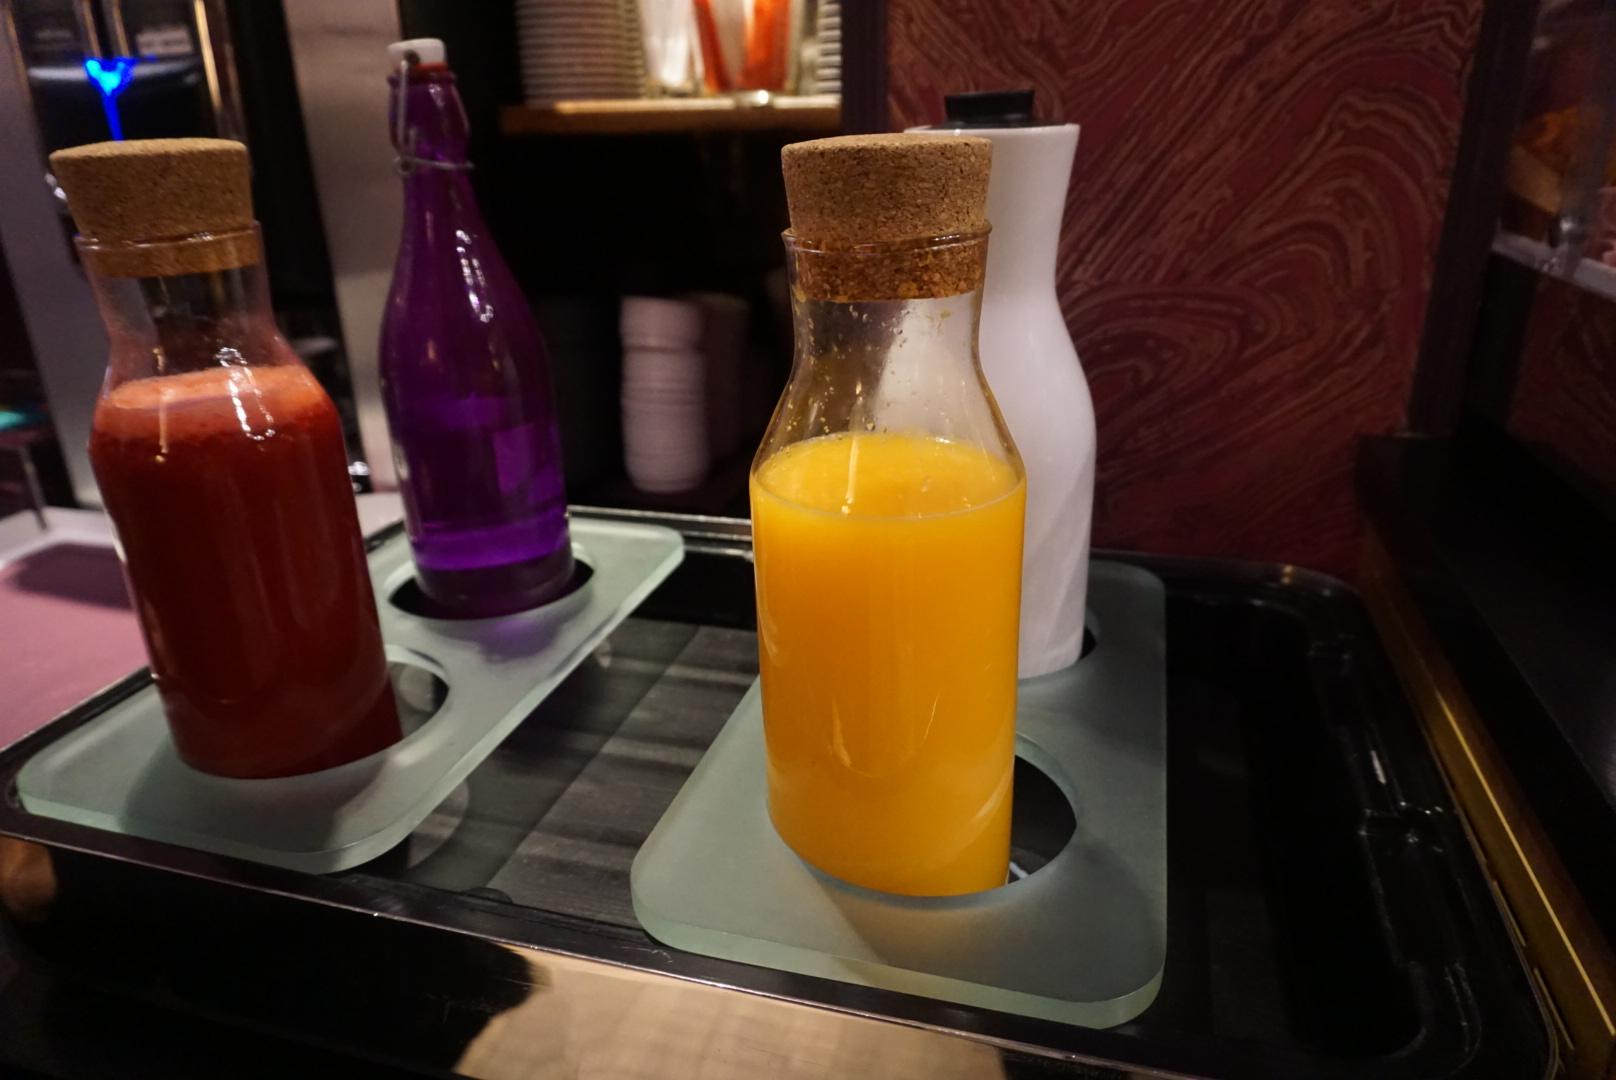 idol hotel colazione succo di frutta